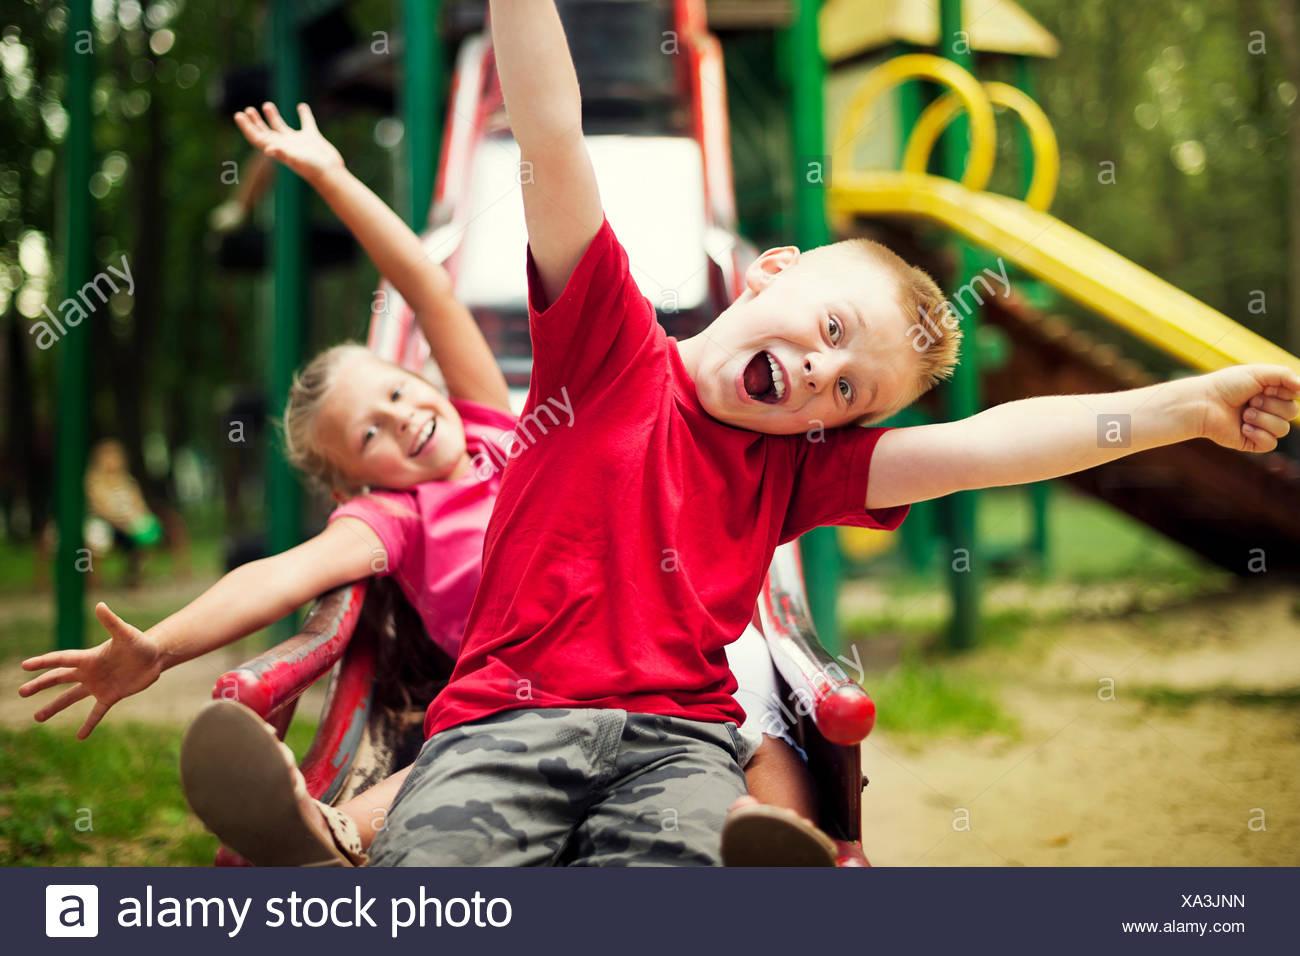 Two kids slide on playground, Debica, Poland - Stock Image